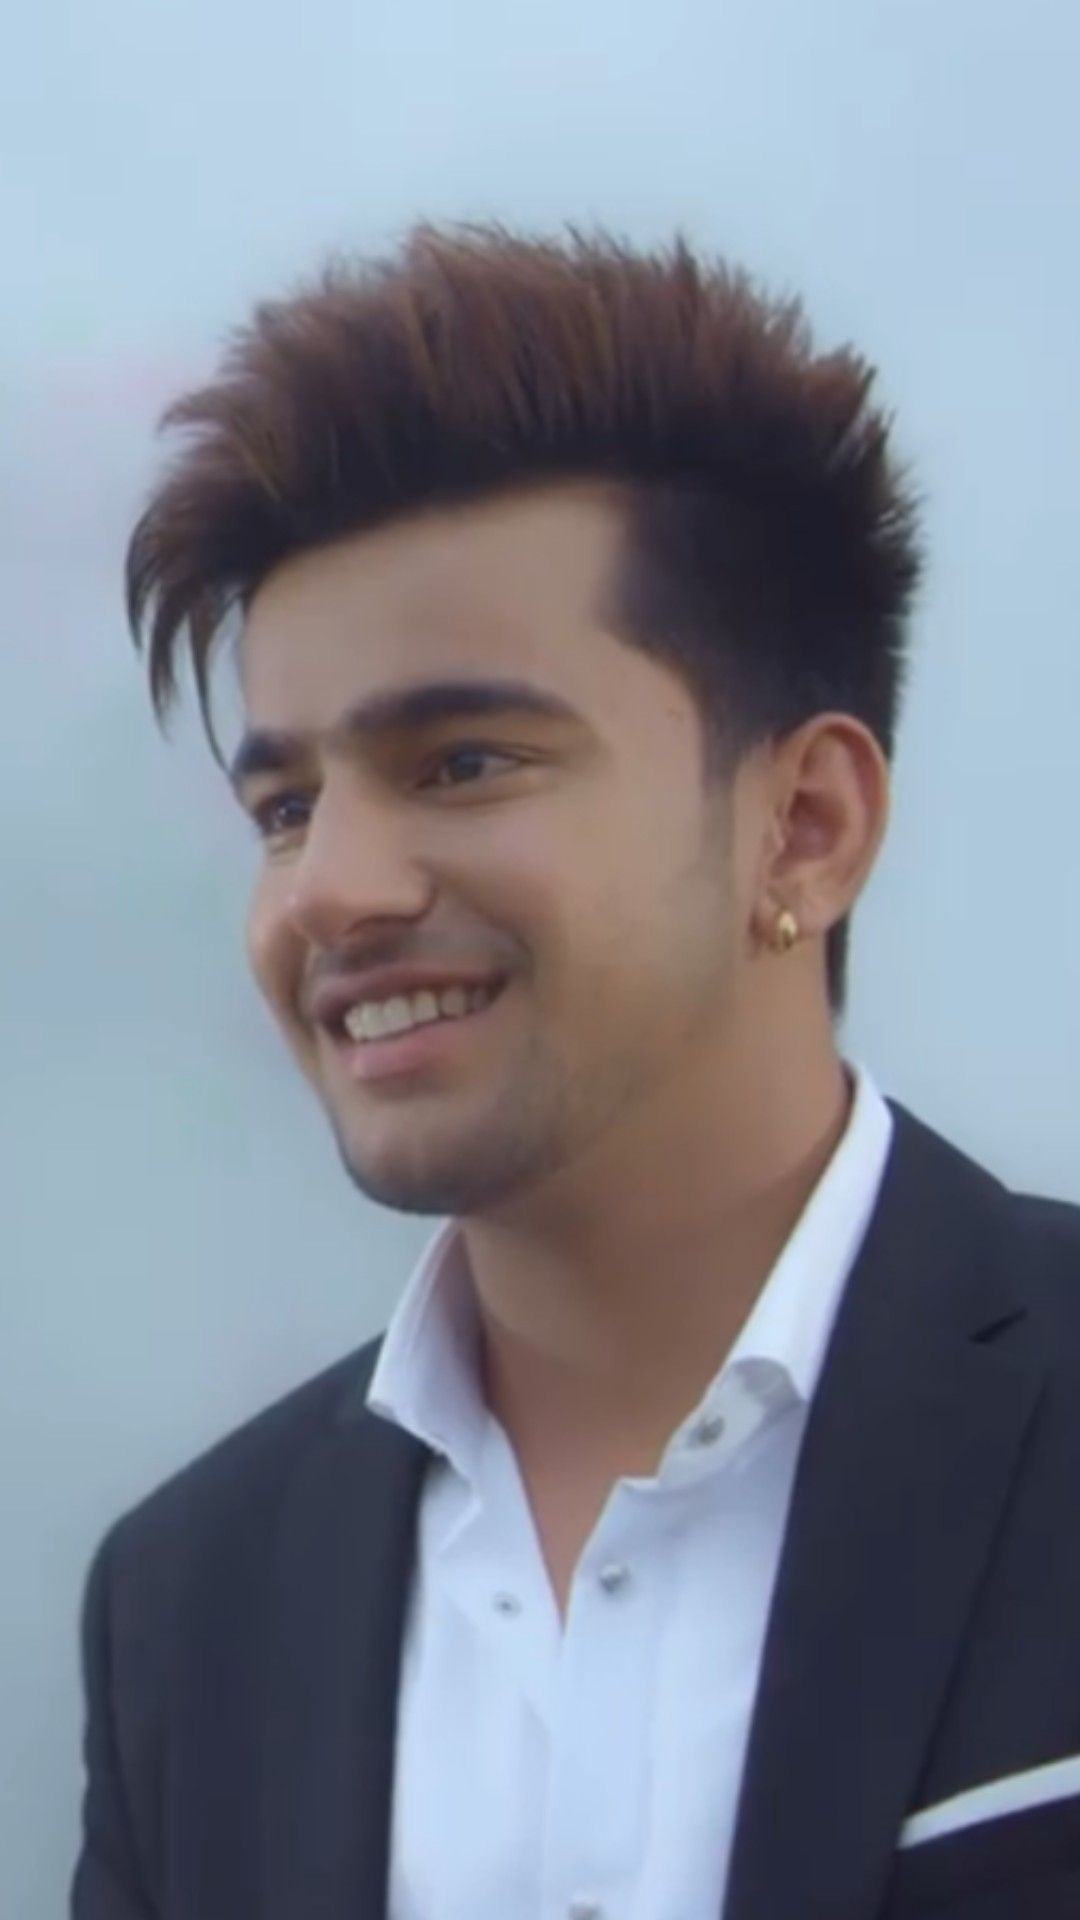 Jass Manak Ajay In 2019 Cute Indian Boys Swag Boys Boy Hairstyles